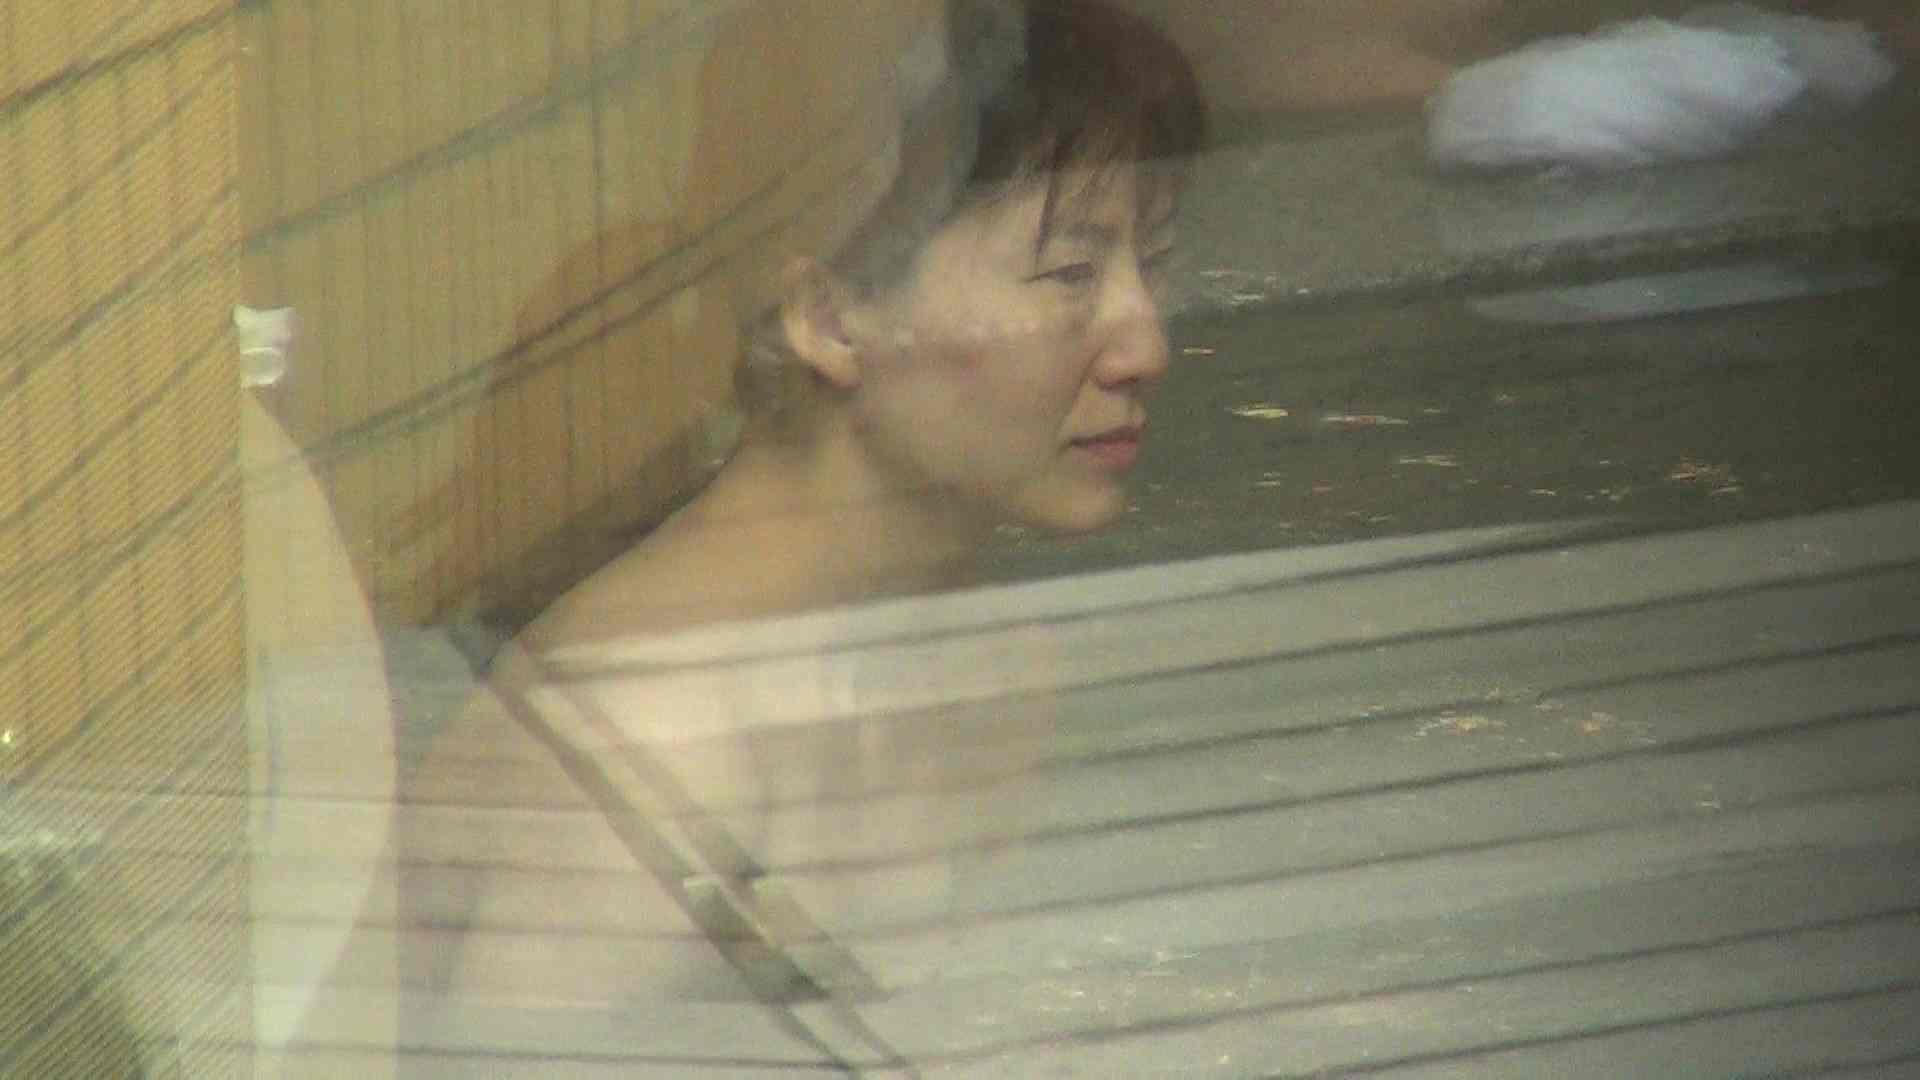 Aquaな露天風呂Vol.299 いやらしいOL オマンコ無修正動画無料 45連発 30